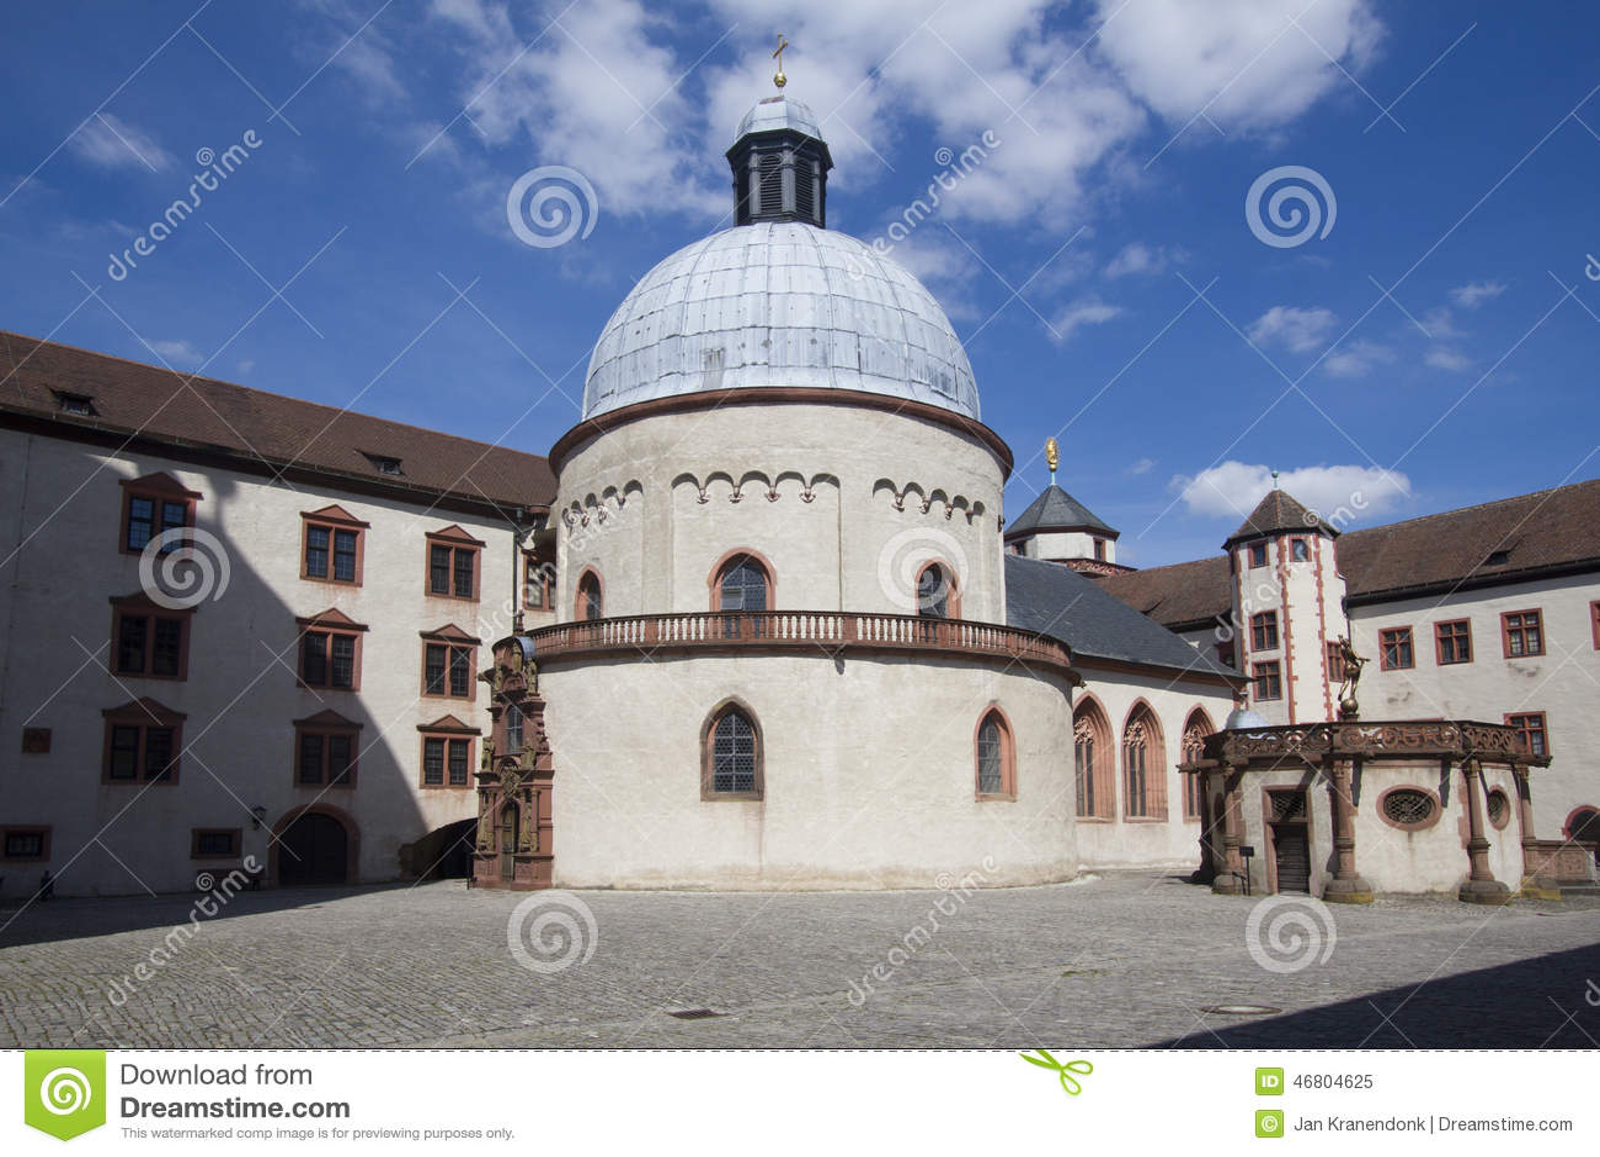 marienberg castle wurzburg stock photo image 46804625. Black Bedroom Furniture Sets. Home Design Ideas